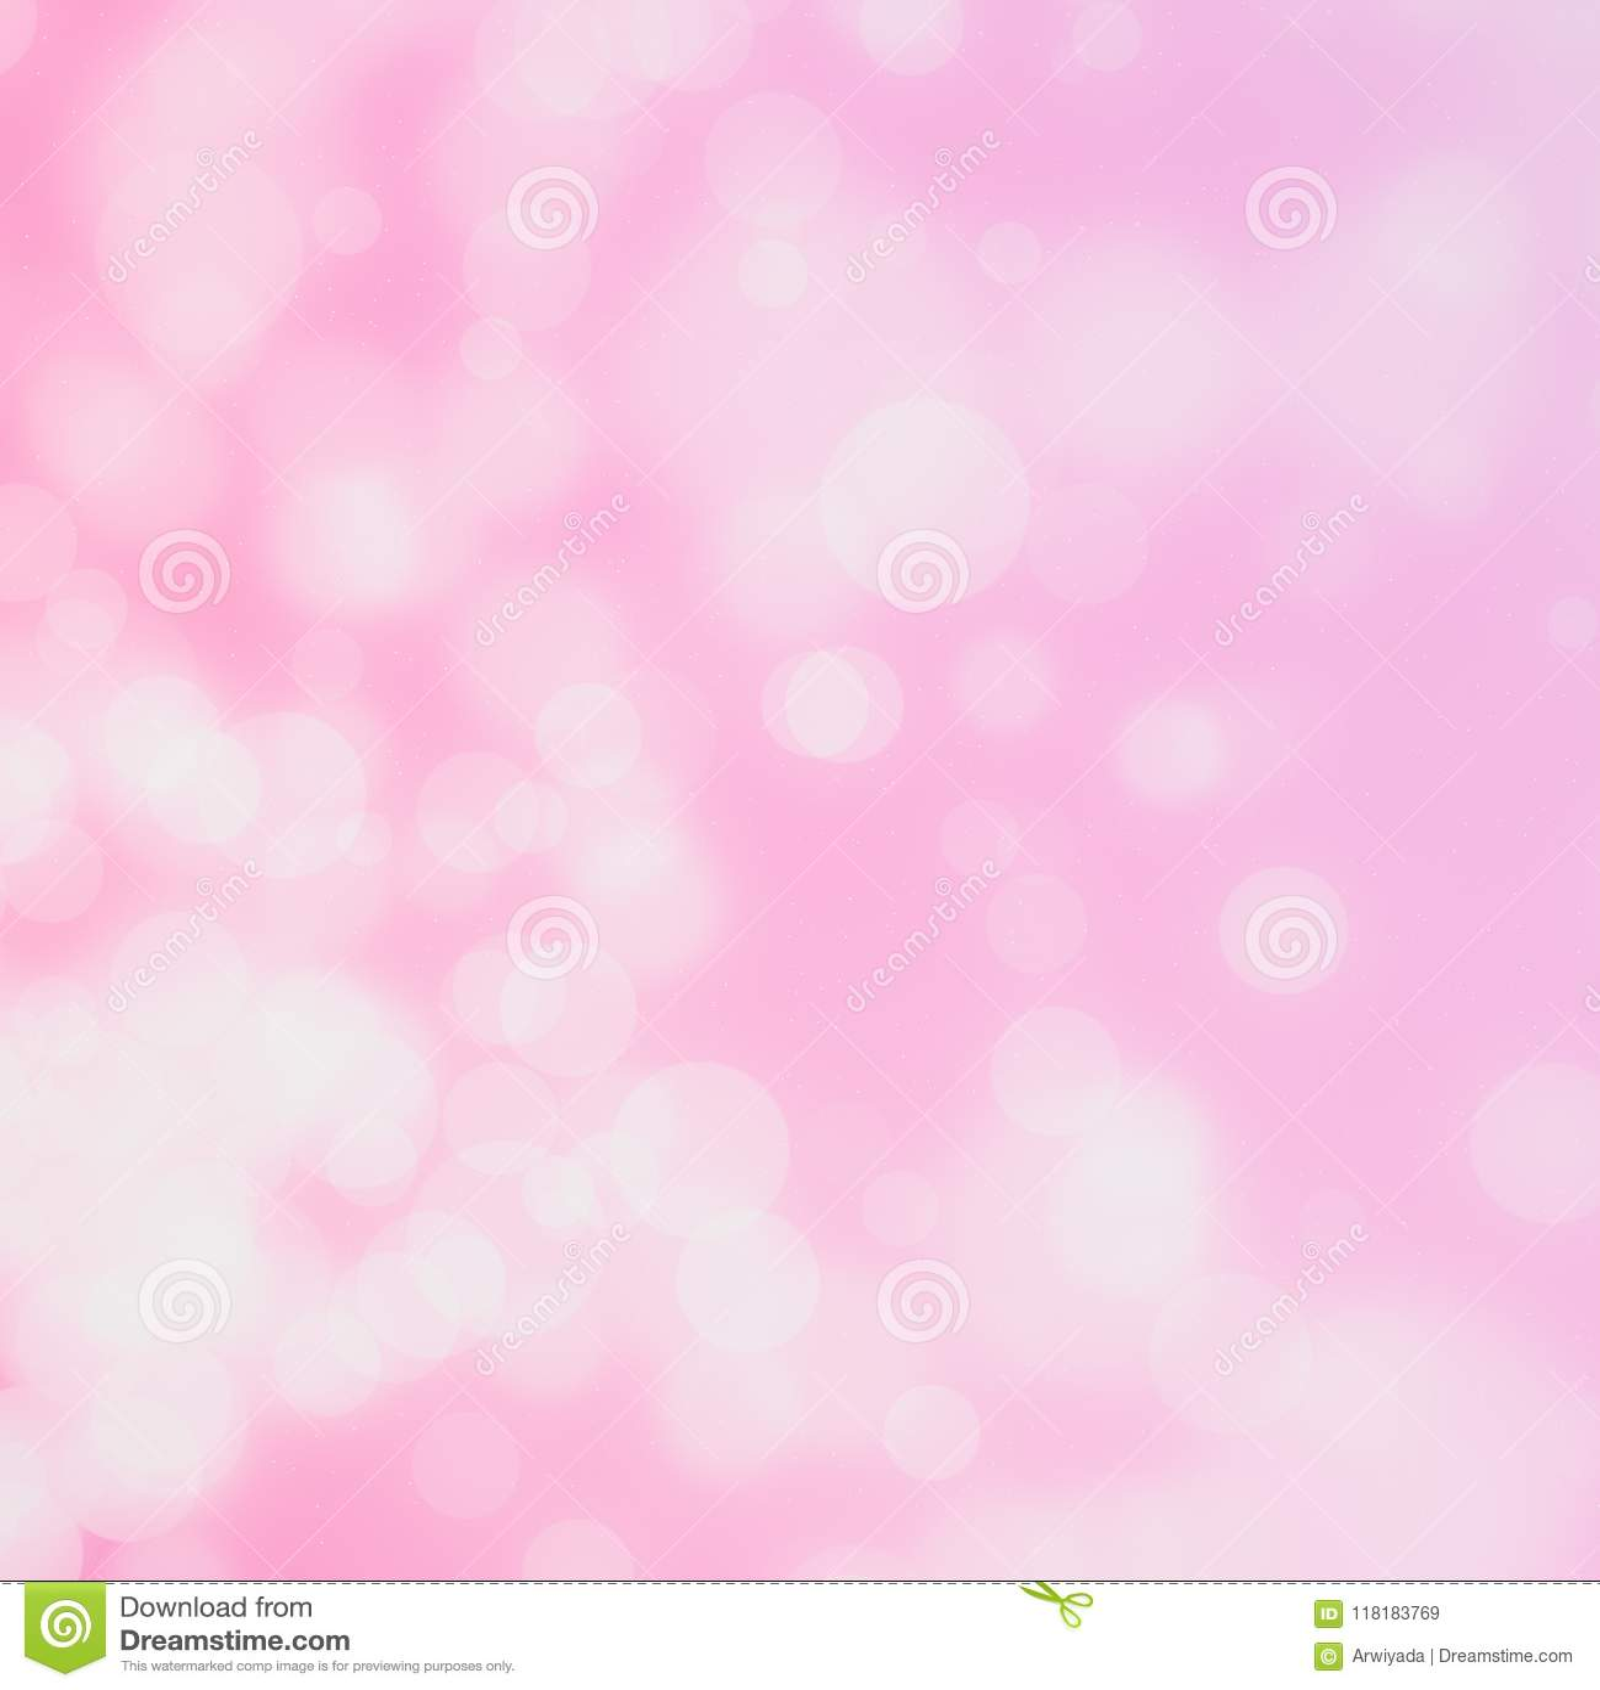 White circle bokeh on pink background blurred light.